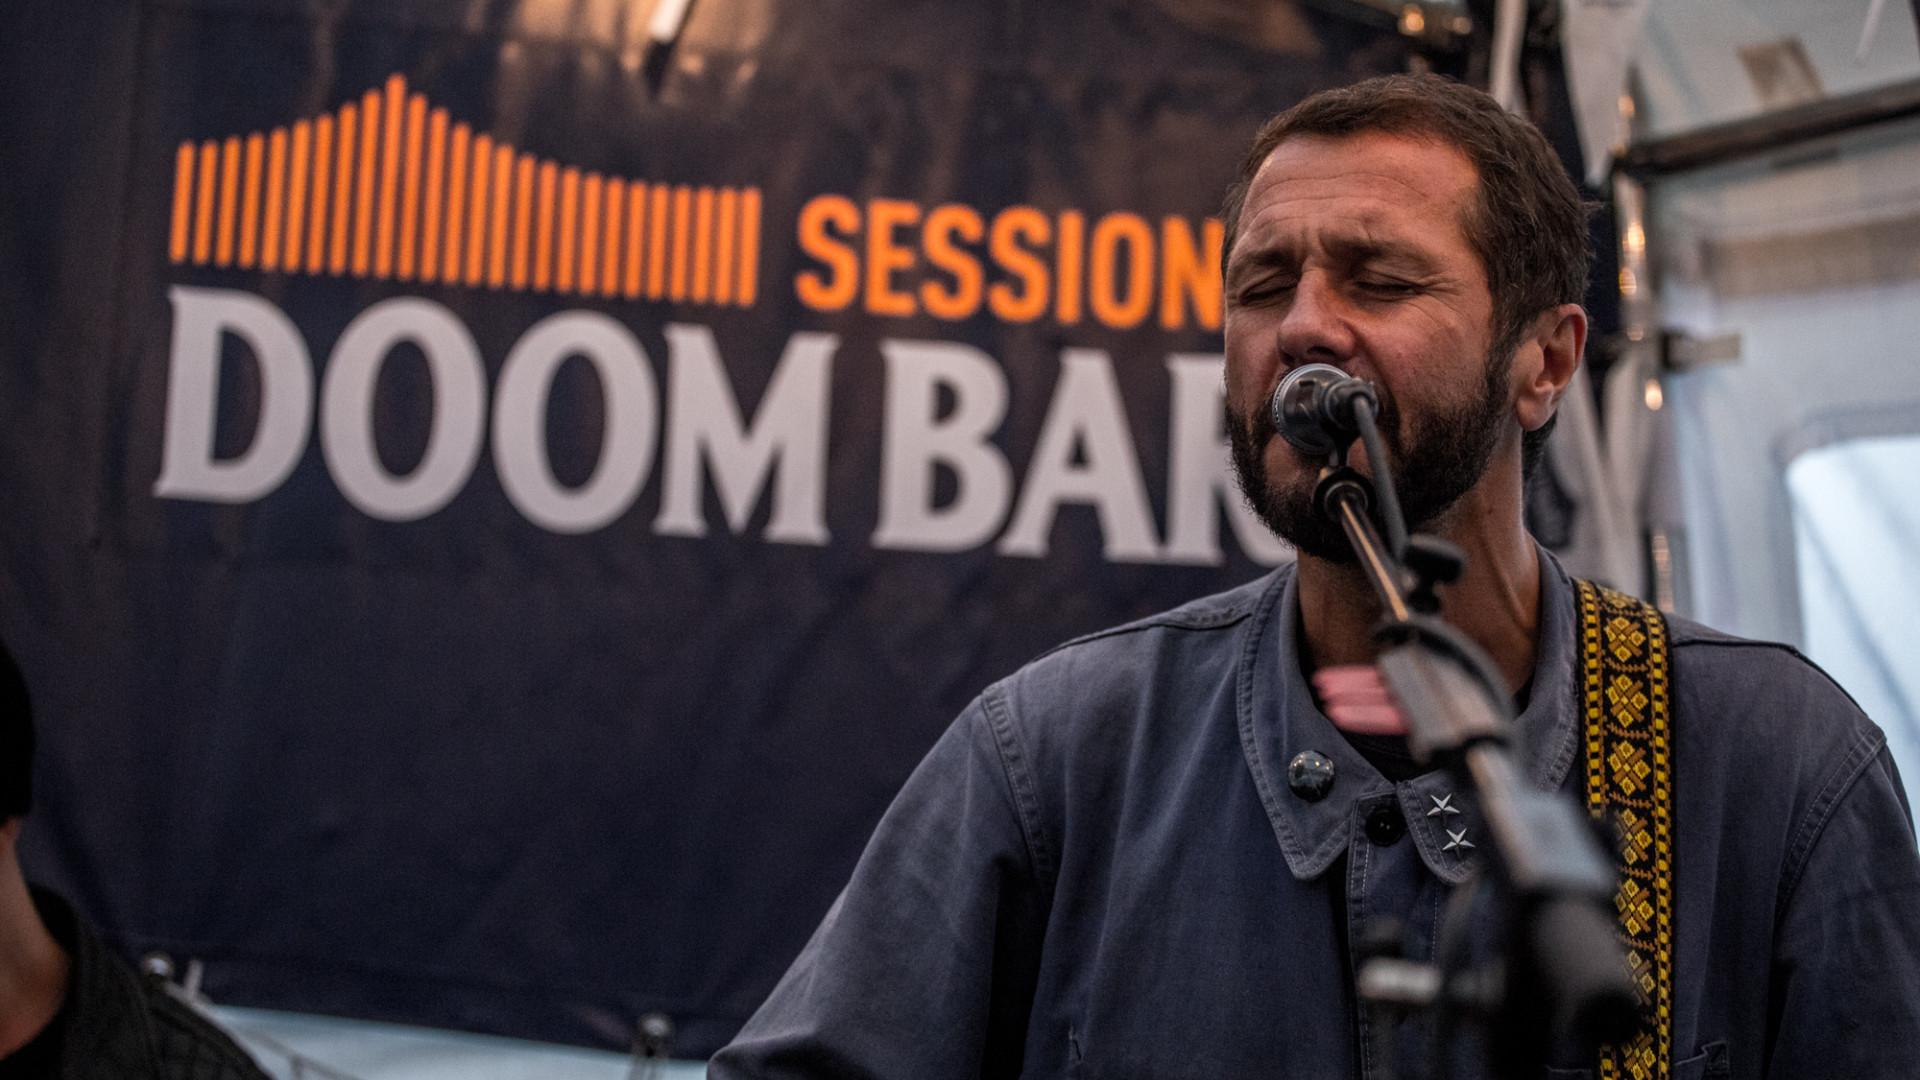 Sharp's Doom Bar Sessions